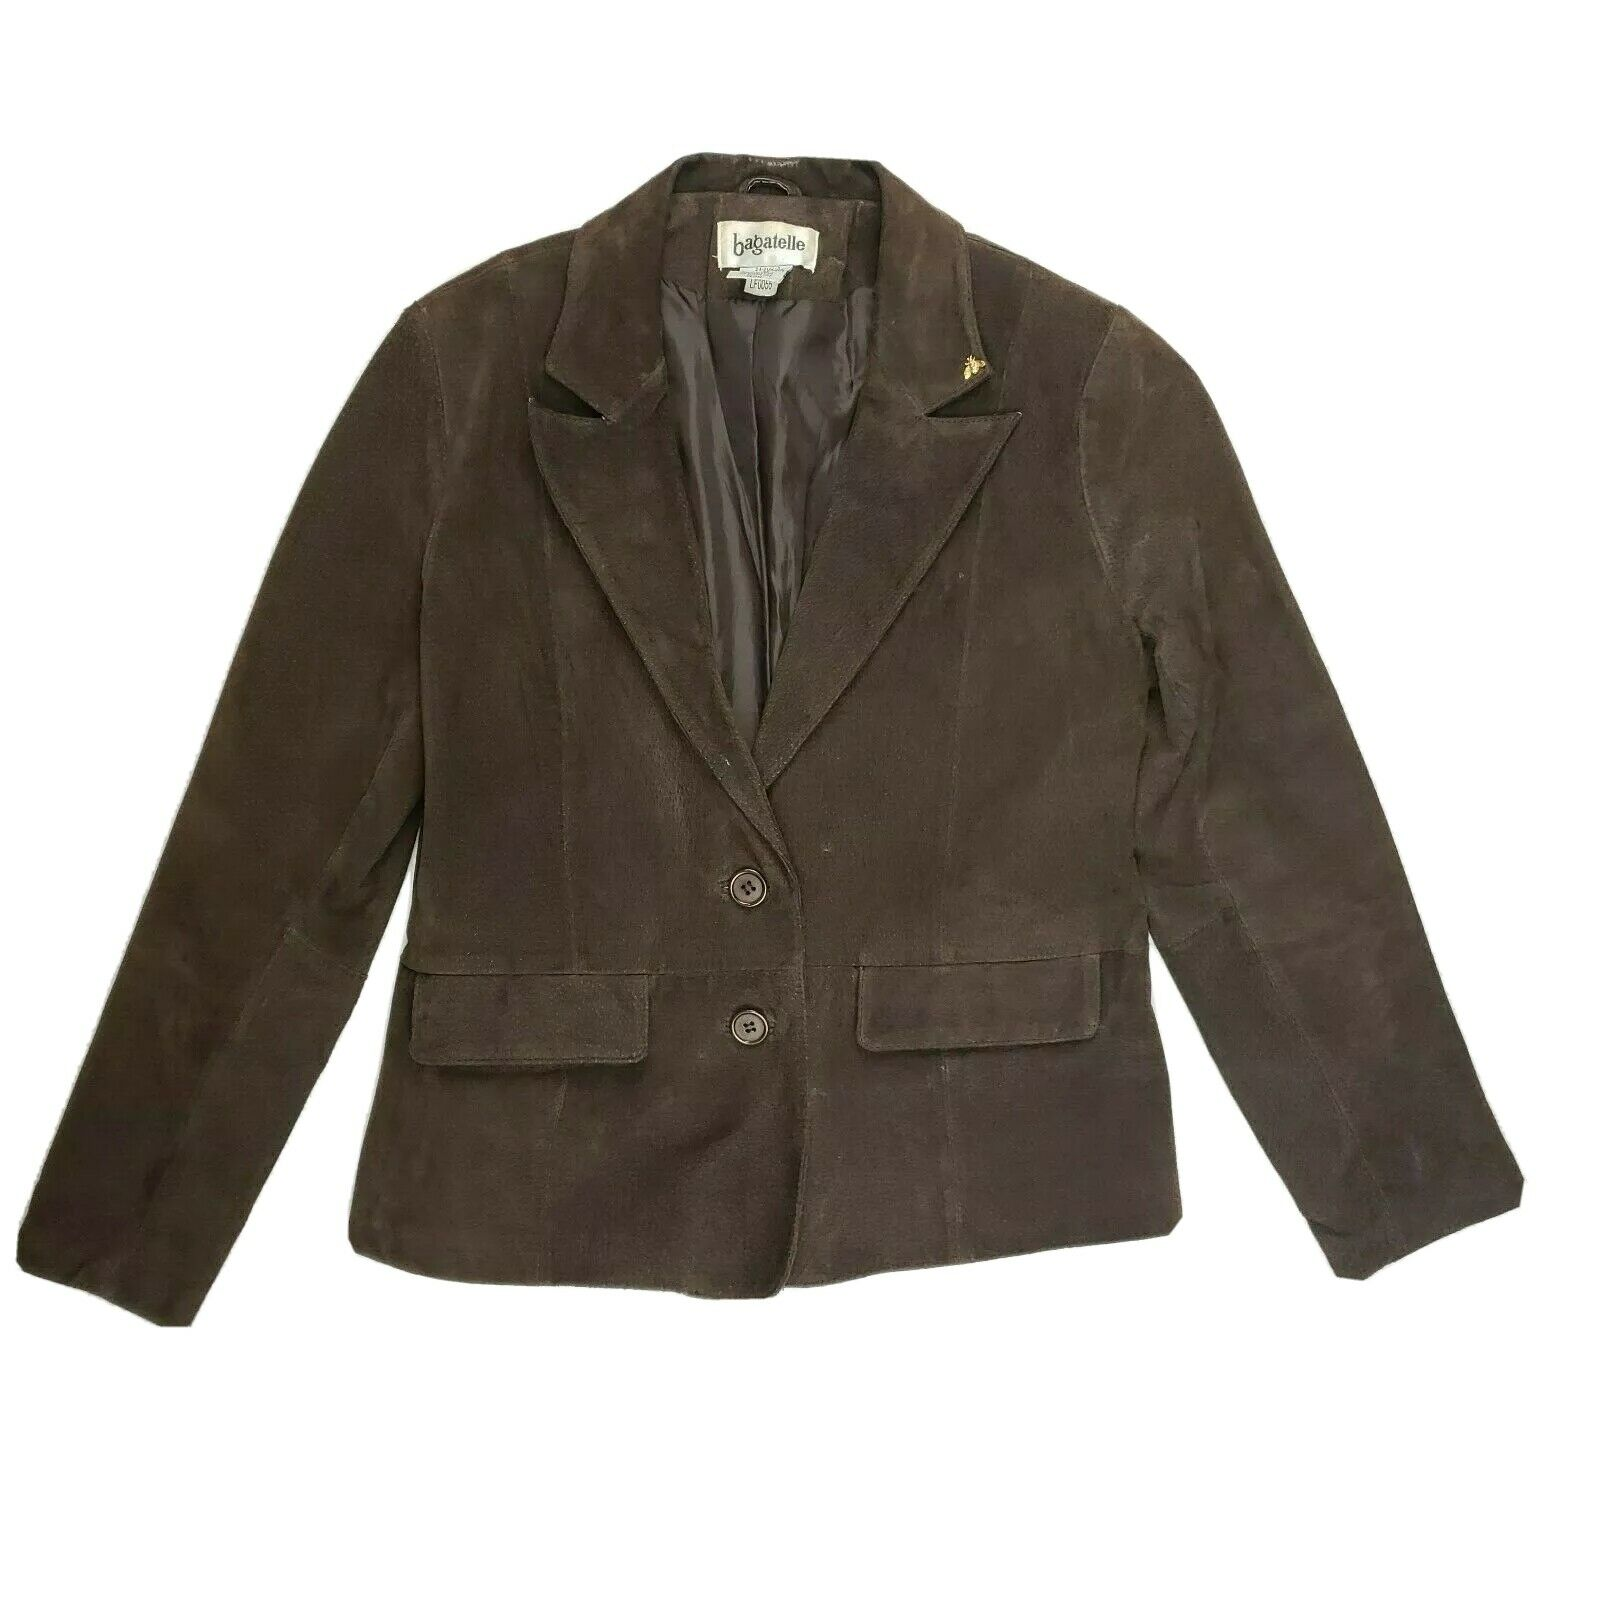 Bagatelle Brown Suede Leather Jacket Coat Blazer Size 8P Petite